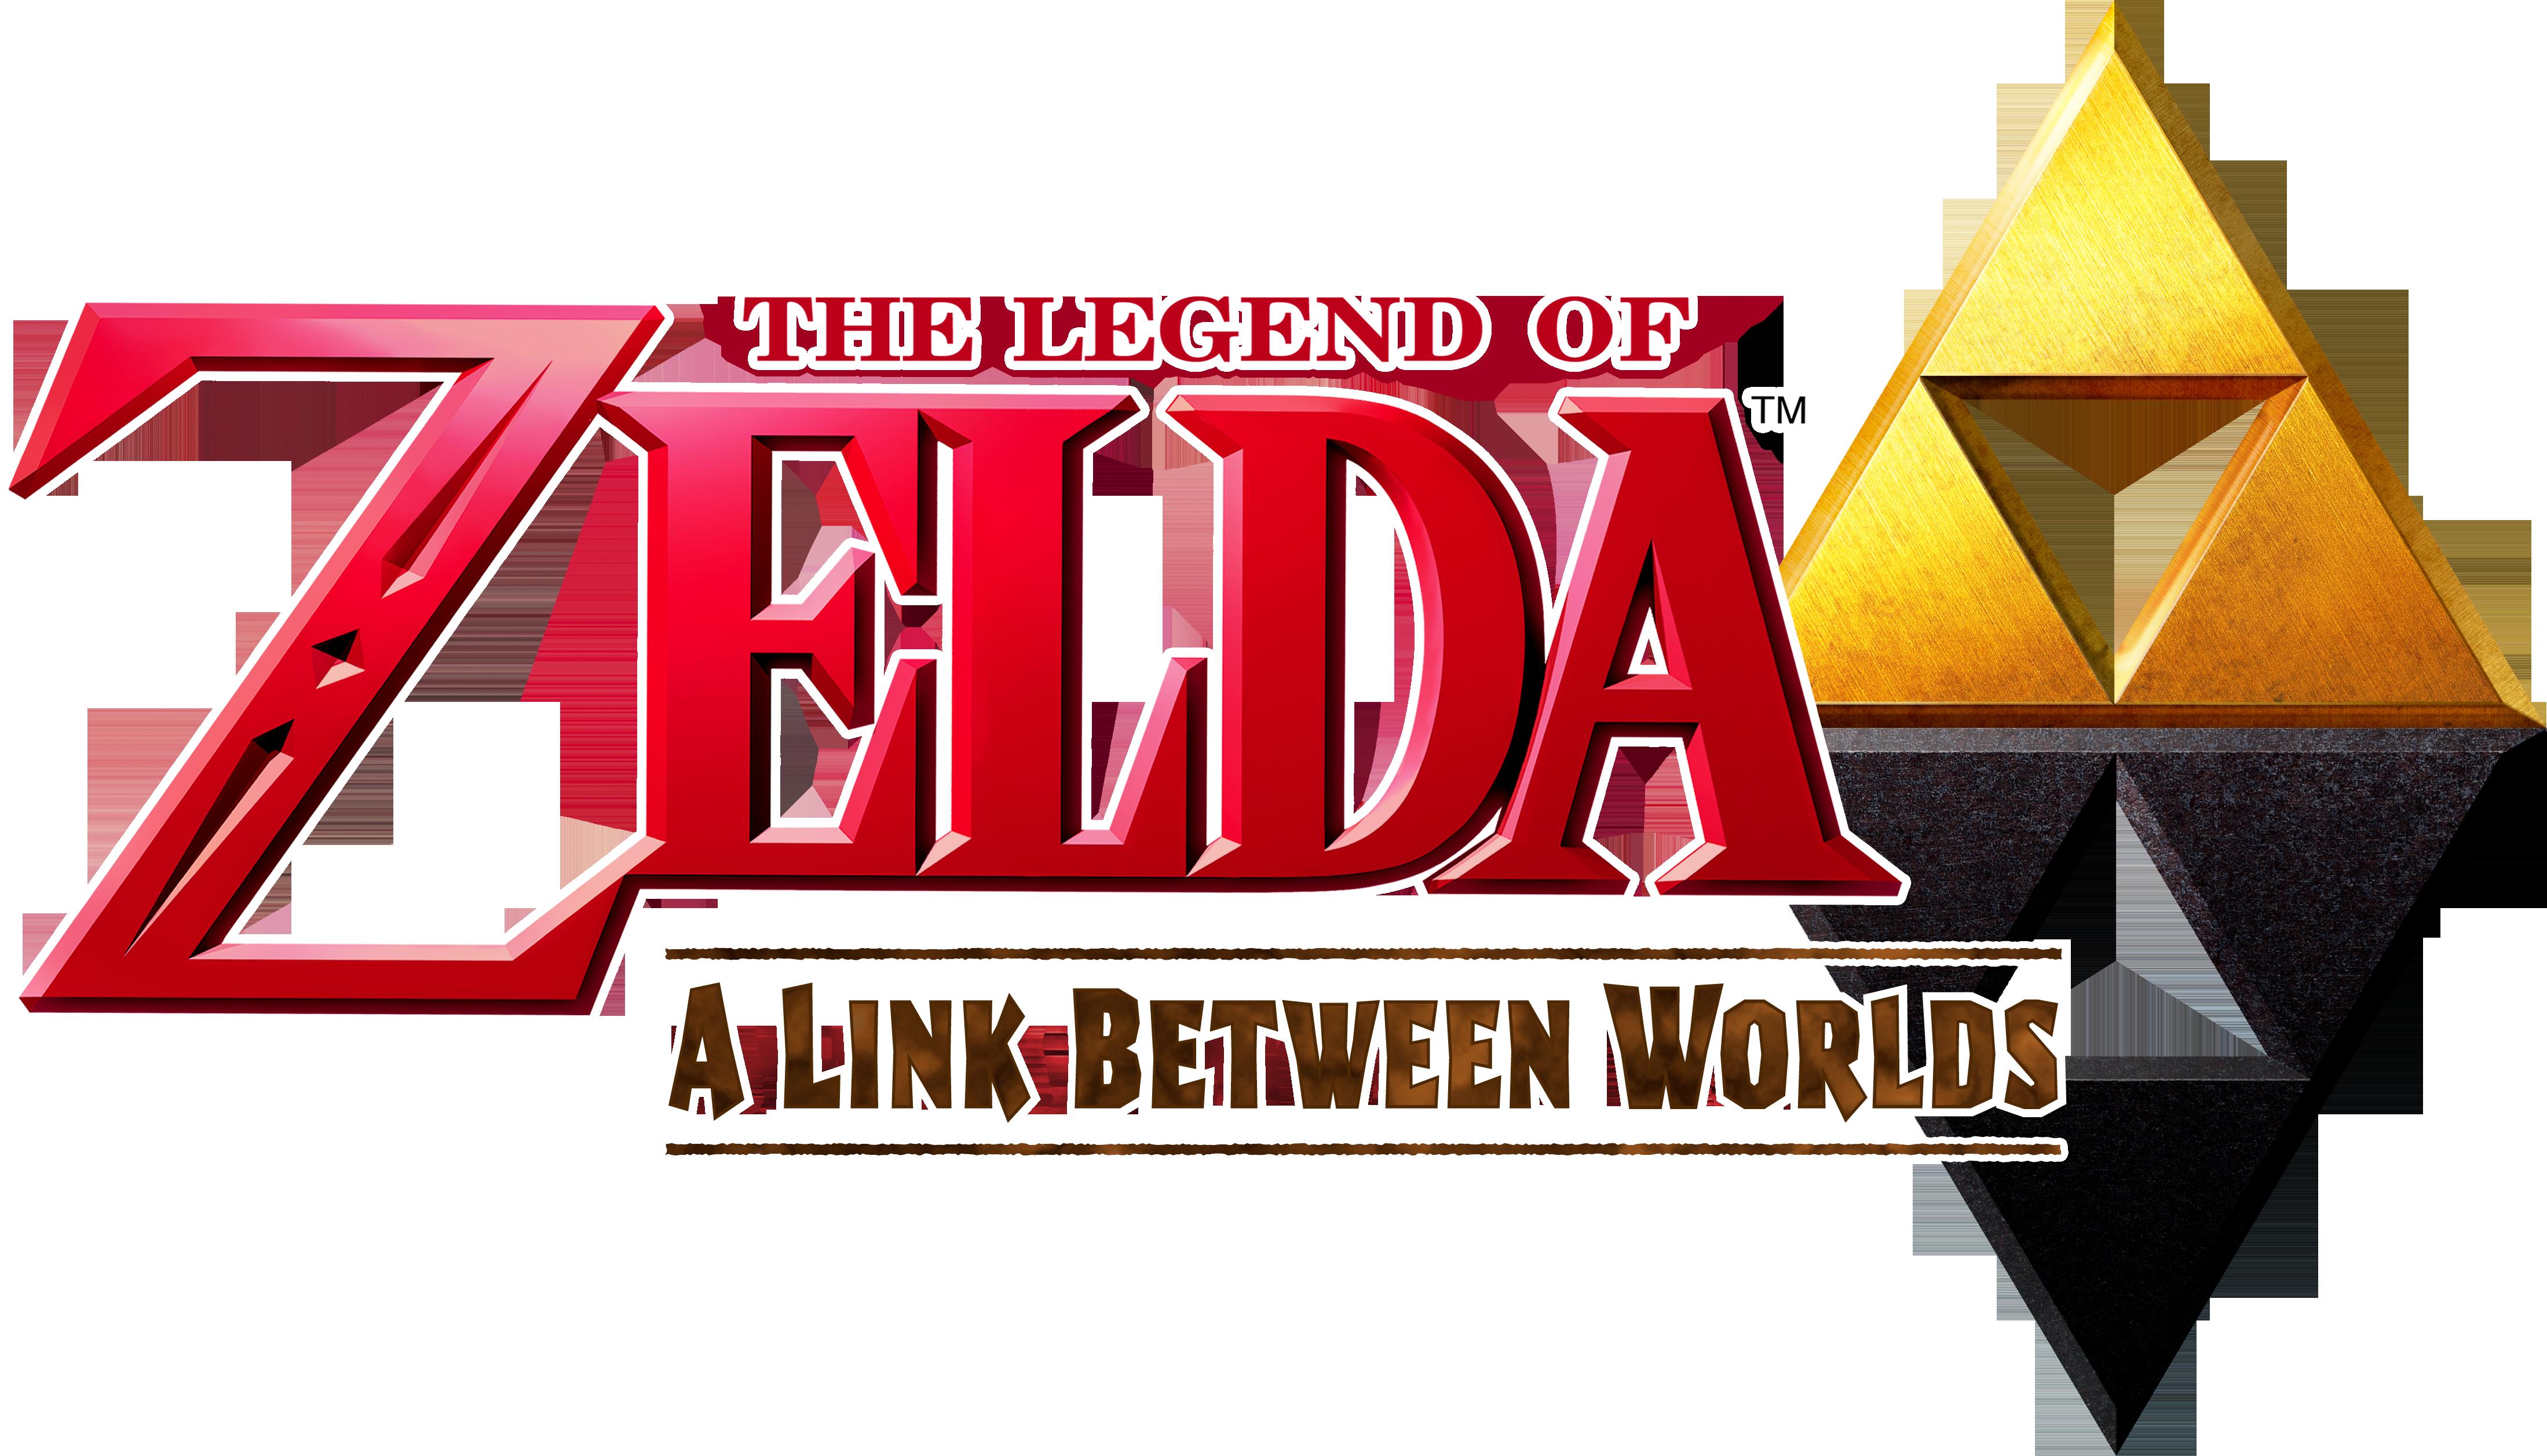 [JEU] The legend of Zelda Latest?cb=20130627200715&path-prefix=fr